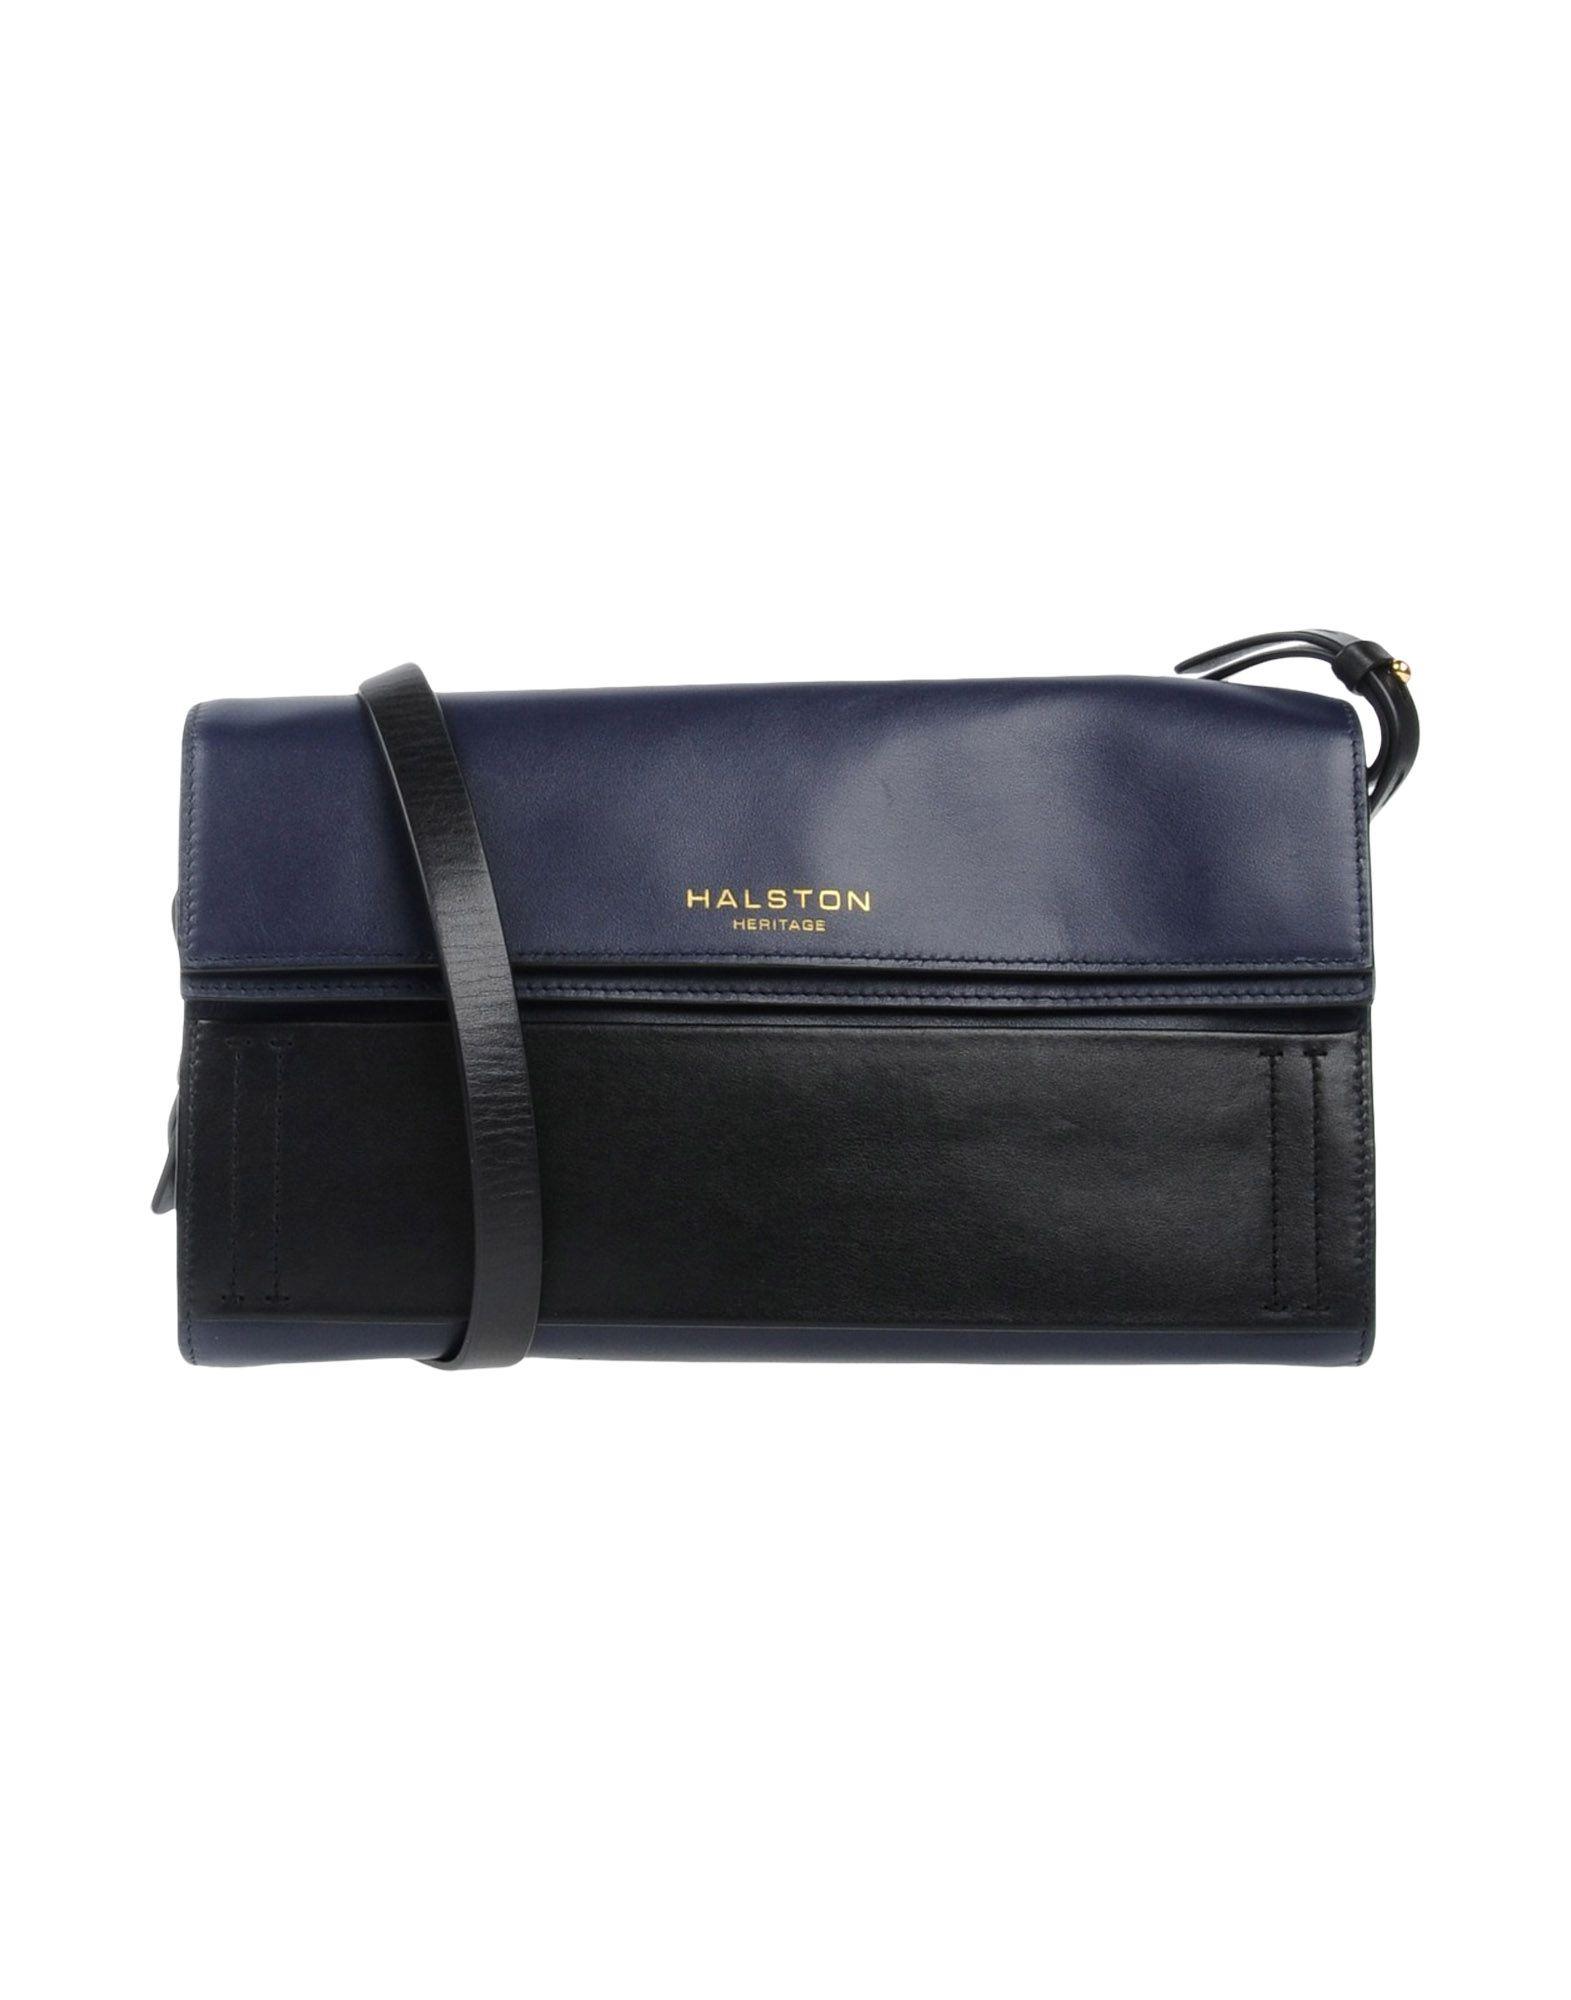 HALSTON HERITAGE Сумка на плечо мужская сумка lakestone halston 923124 923124 db